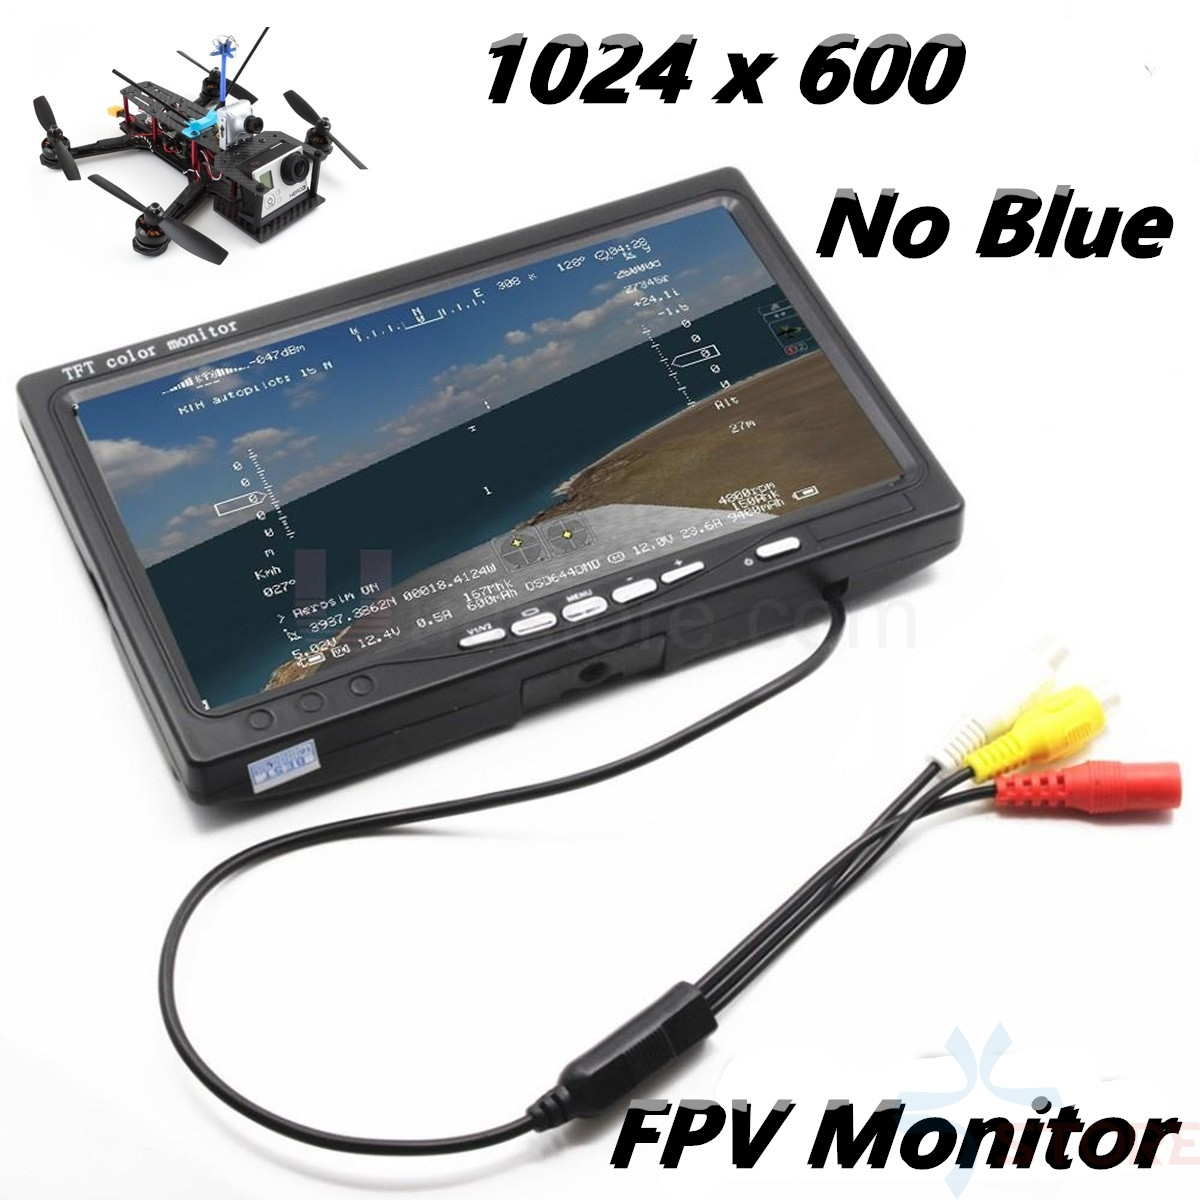 7 inch LCD TFT FPV Monitor 1024x600 w/T plug Screen No blue FPV Monitor Photography for Ground Station Phantom RC Model QAV250